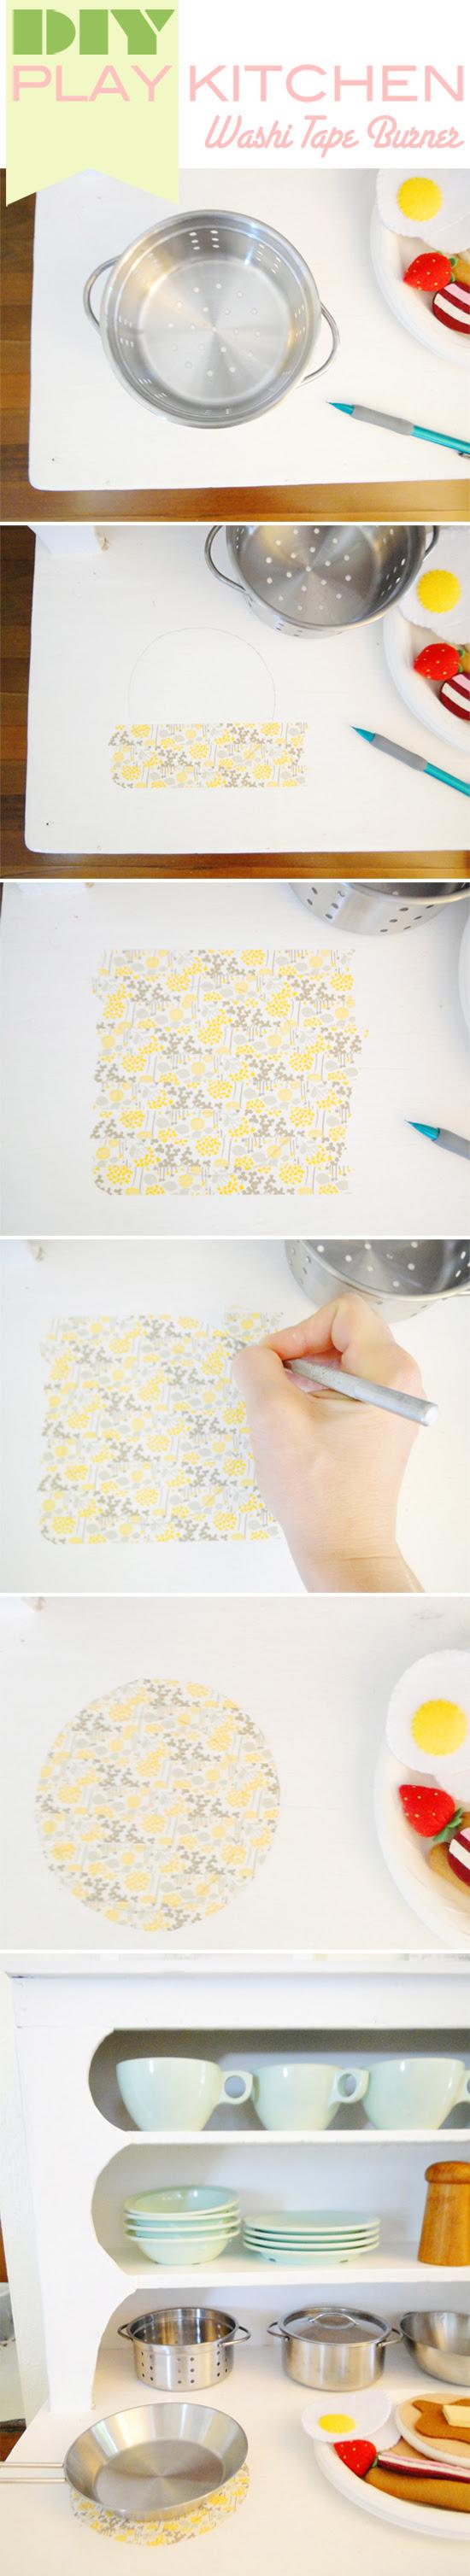 DIY-Play-Kitchen-Washi-Tape-Burner